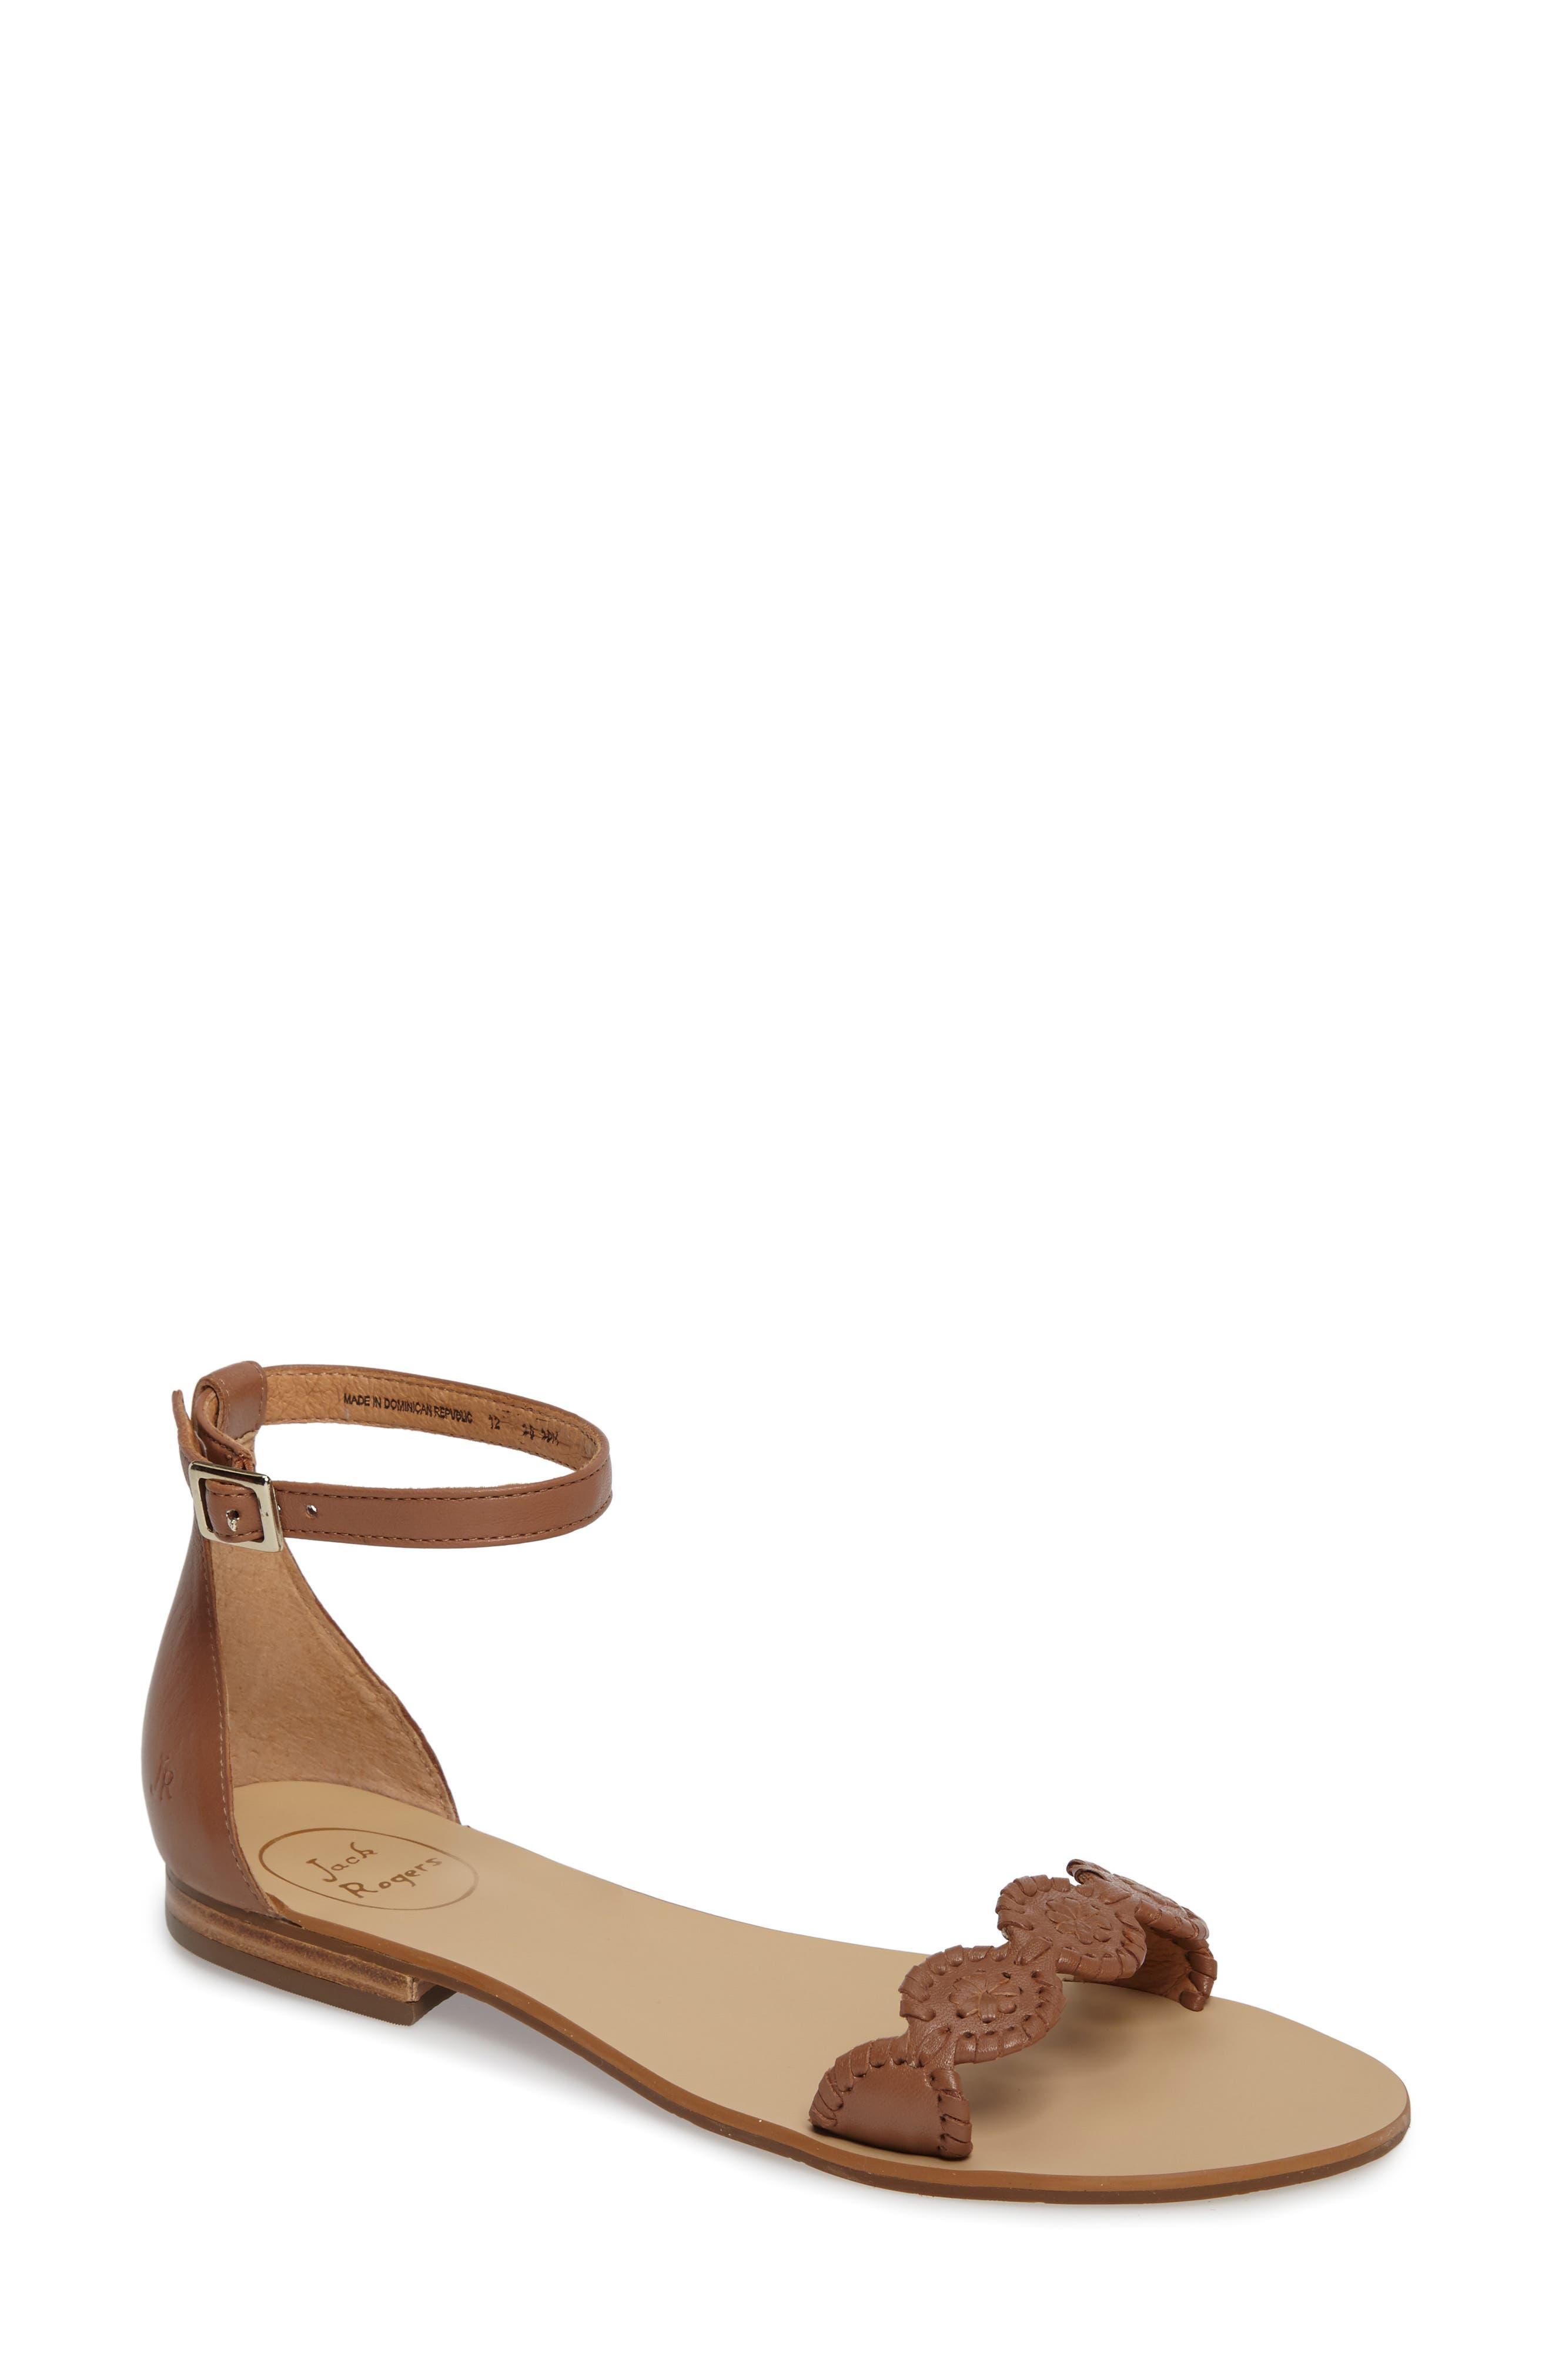 JACK ROGERS Daphne Medallion Flat Sandal